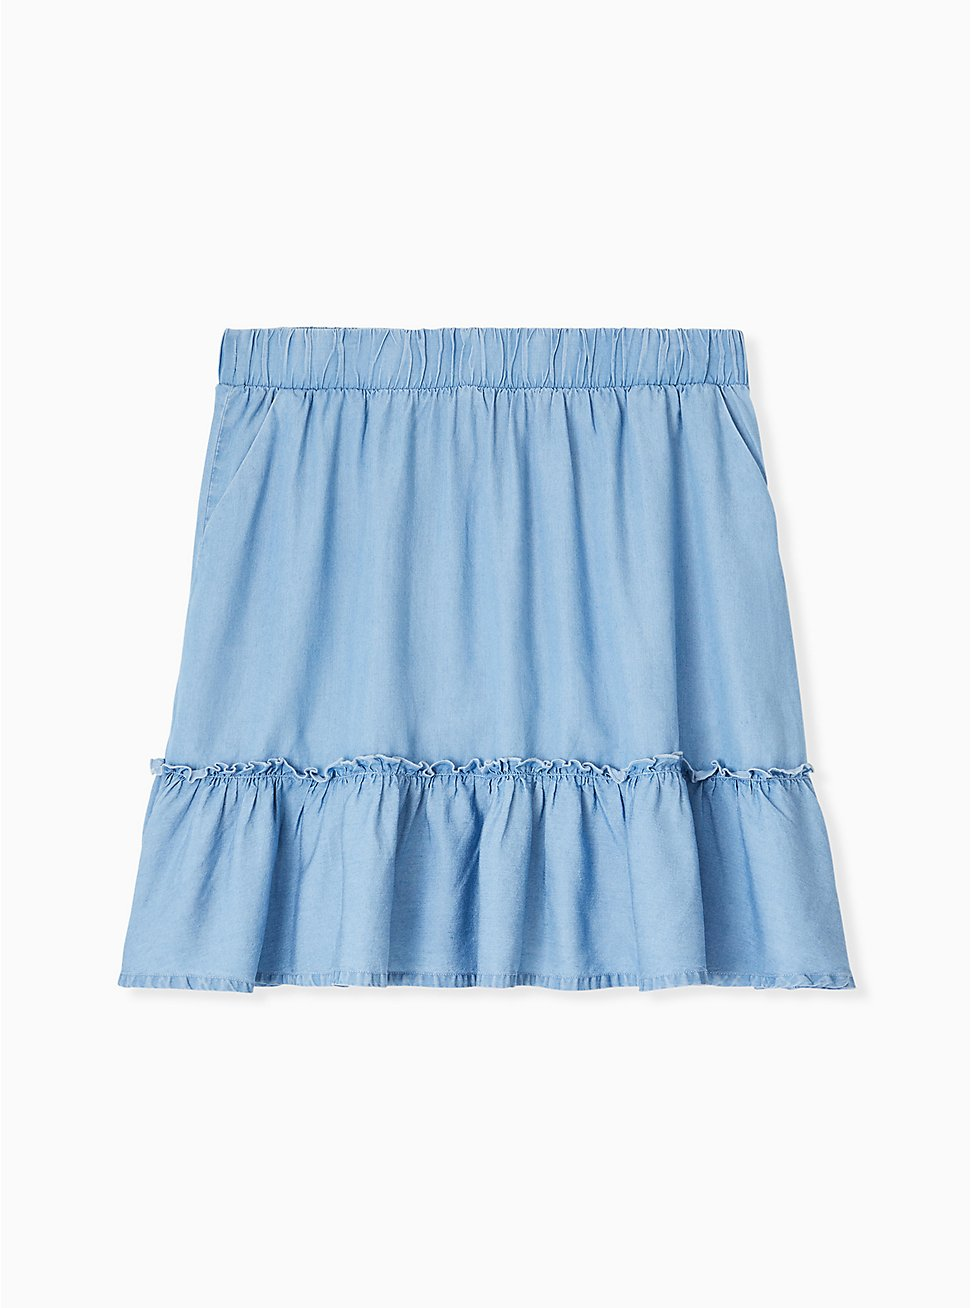 Plus Size Blue Chambray Ruffle Mini Skirt, CHAMBRAY, hi-res